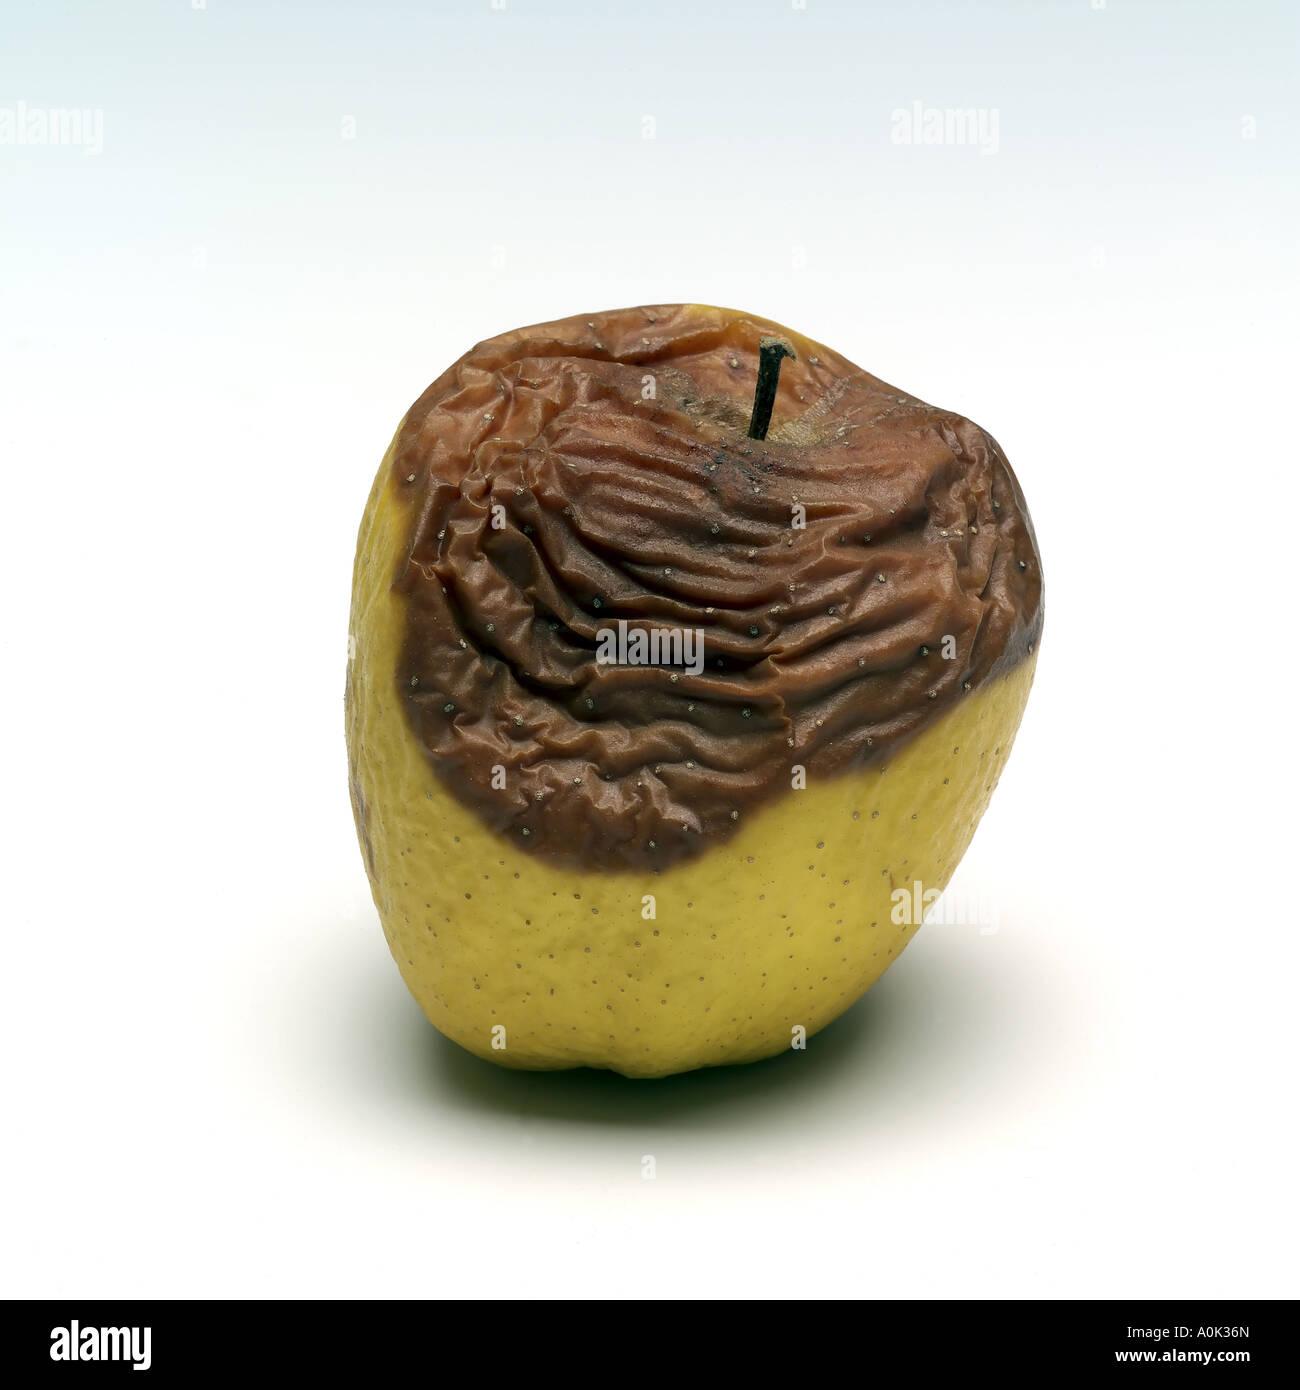 Rotten Golden Delicious apple - Stock Image